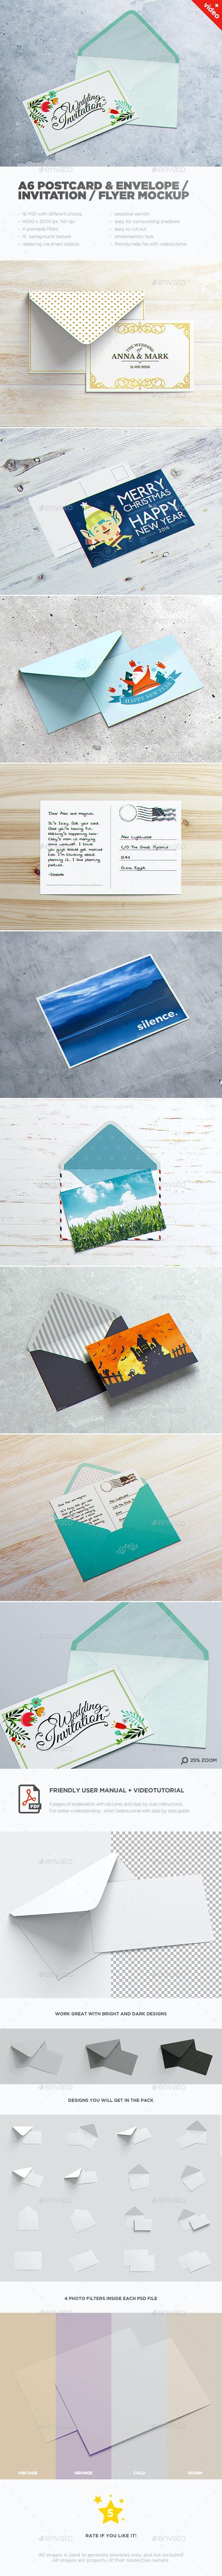 A6 Postcard & Envelope / Invitation / Flyer MockUp - Miscellaneous Print